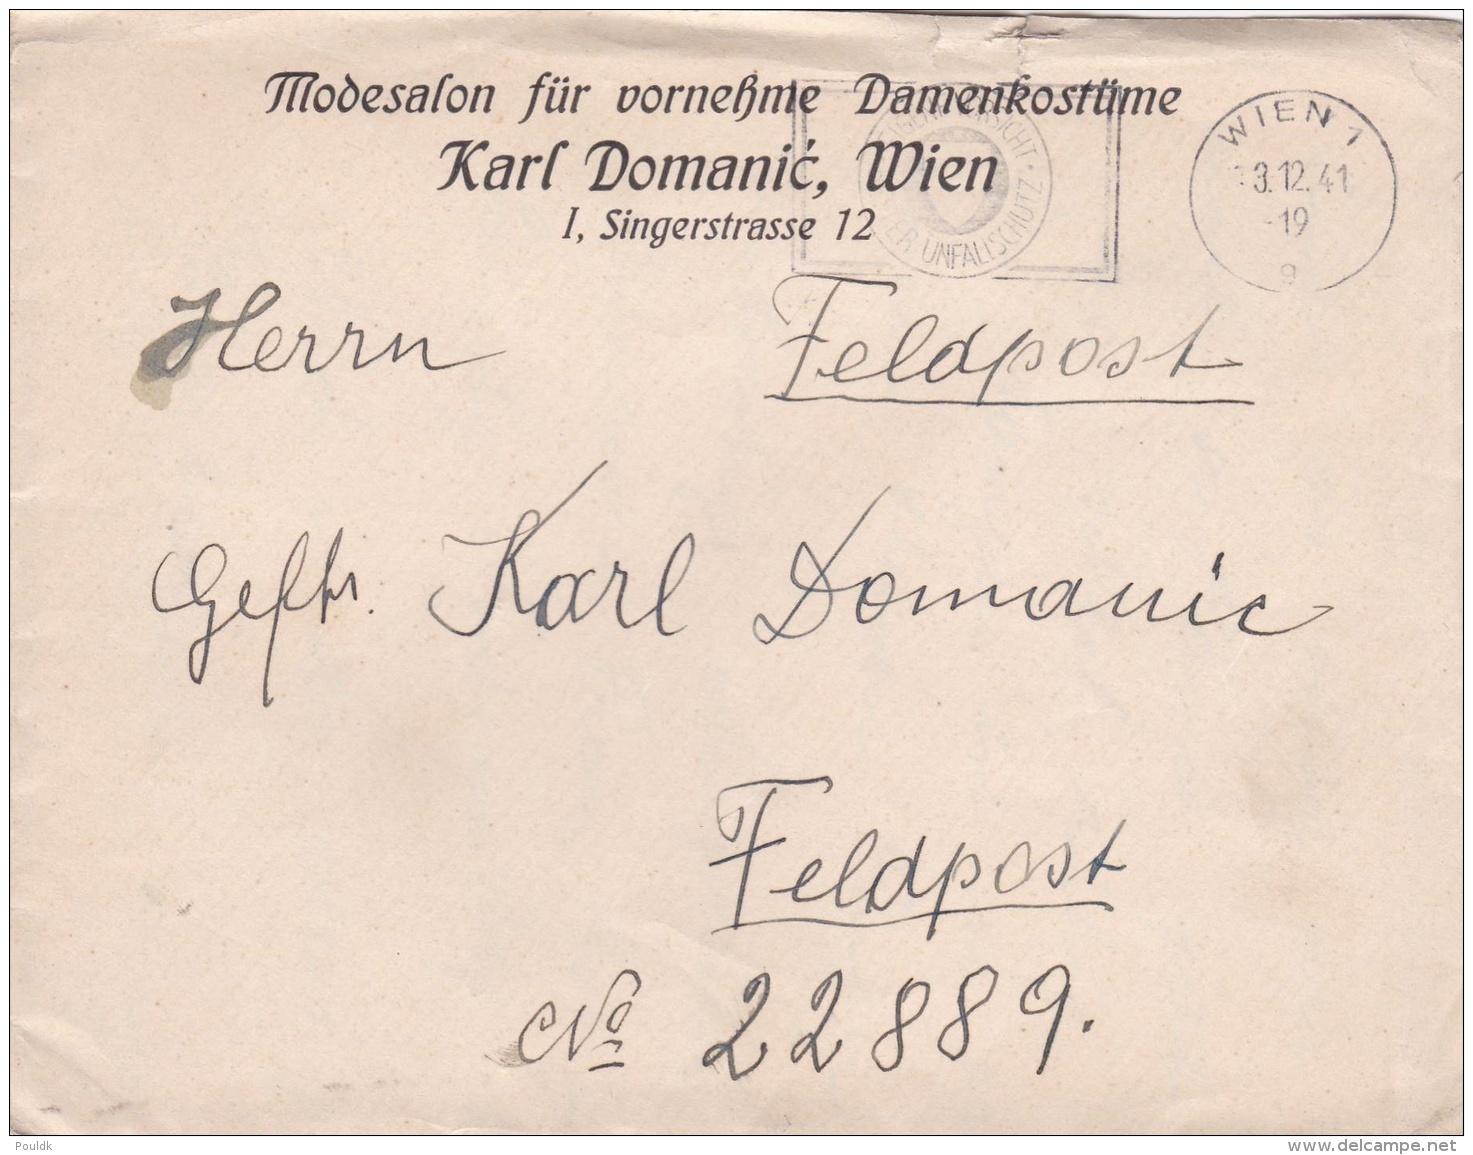 Feldpost WW2: To Mitrovica In Kosovo - Ortskommandantur (I) 861 FP 22889 P/m Wien 1 3.12.1941 - Letter Inside Also On St - Militaria